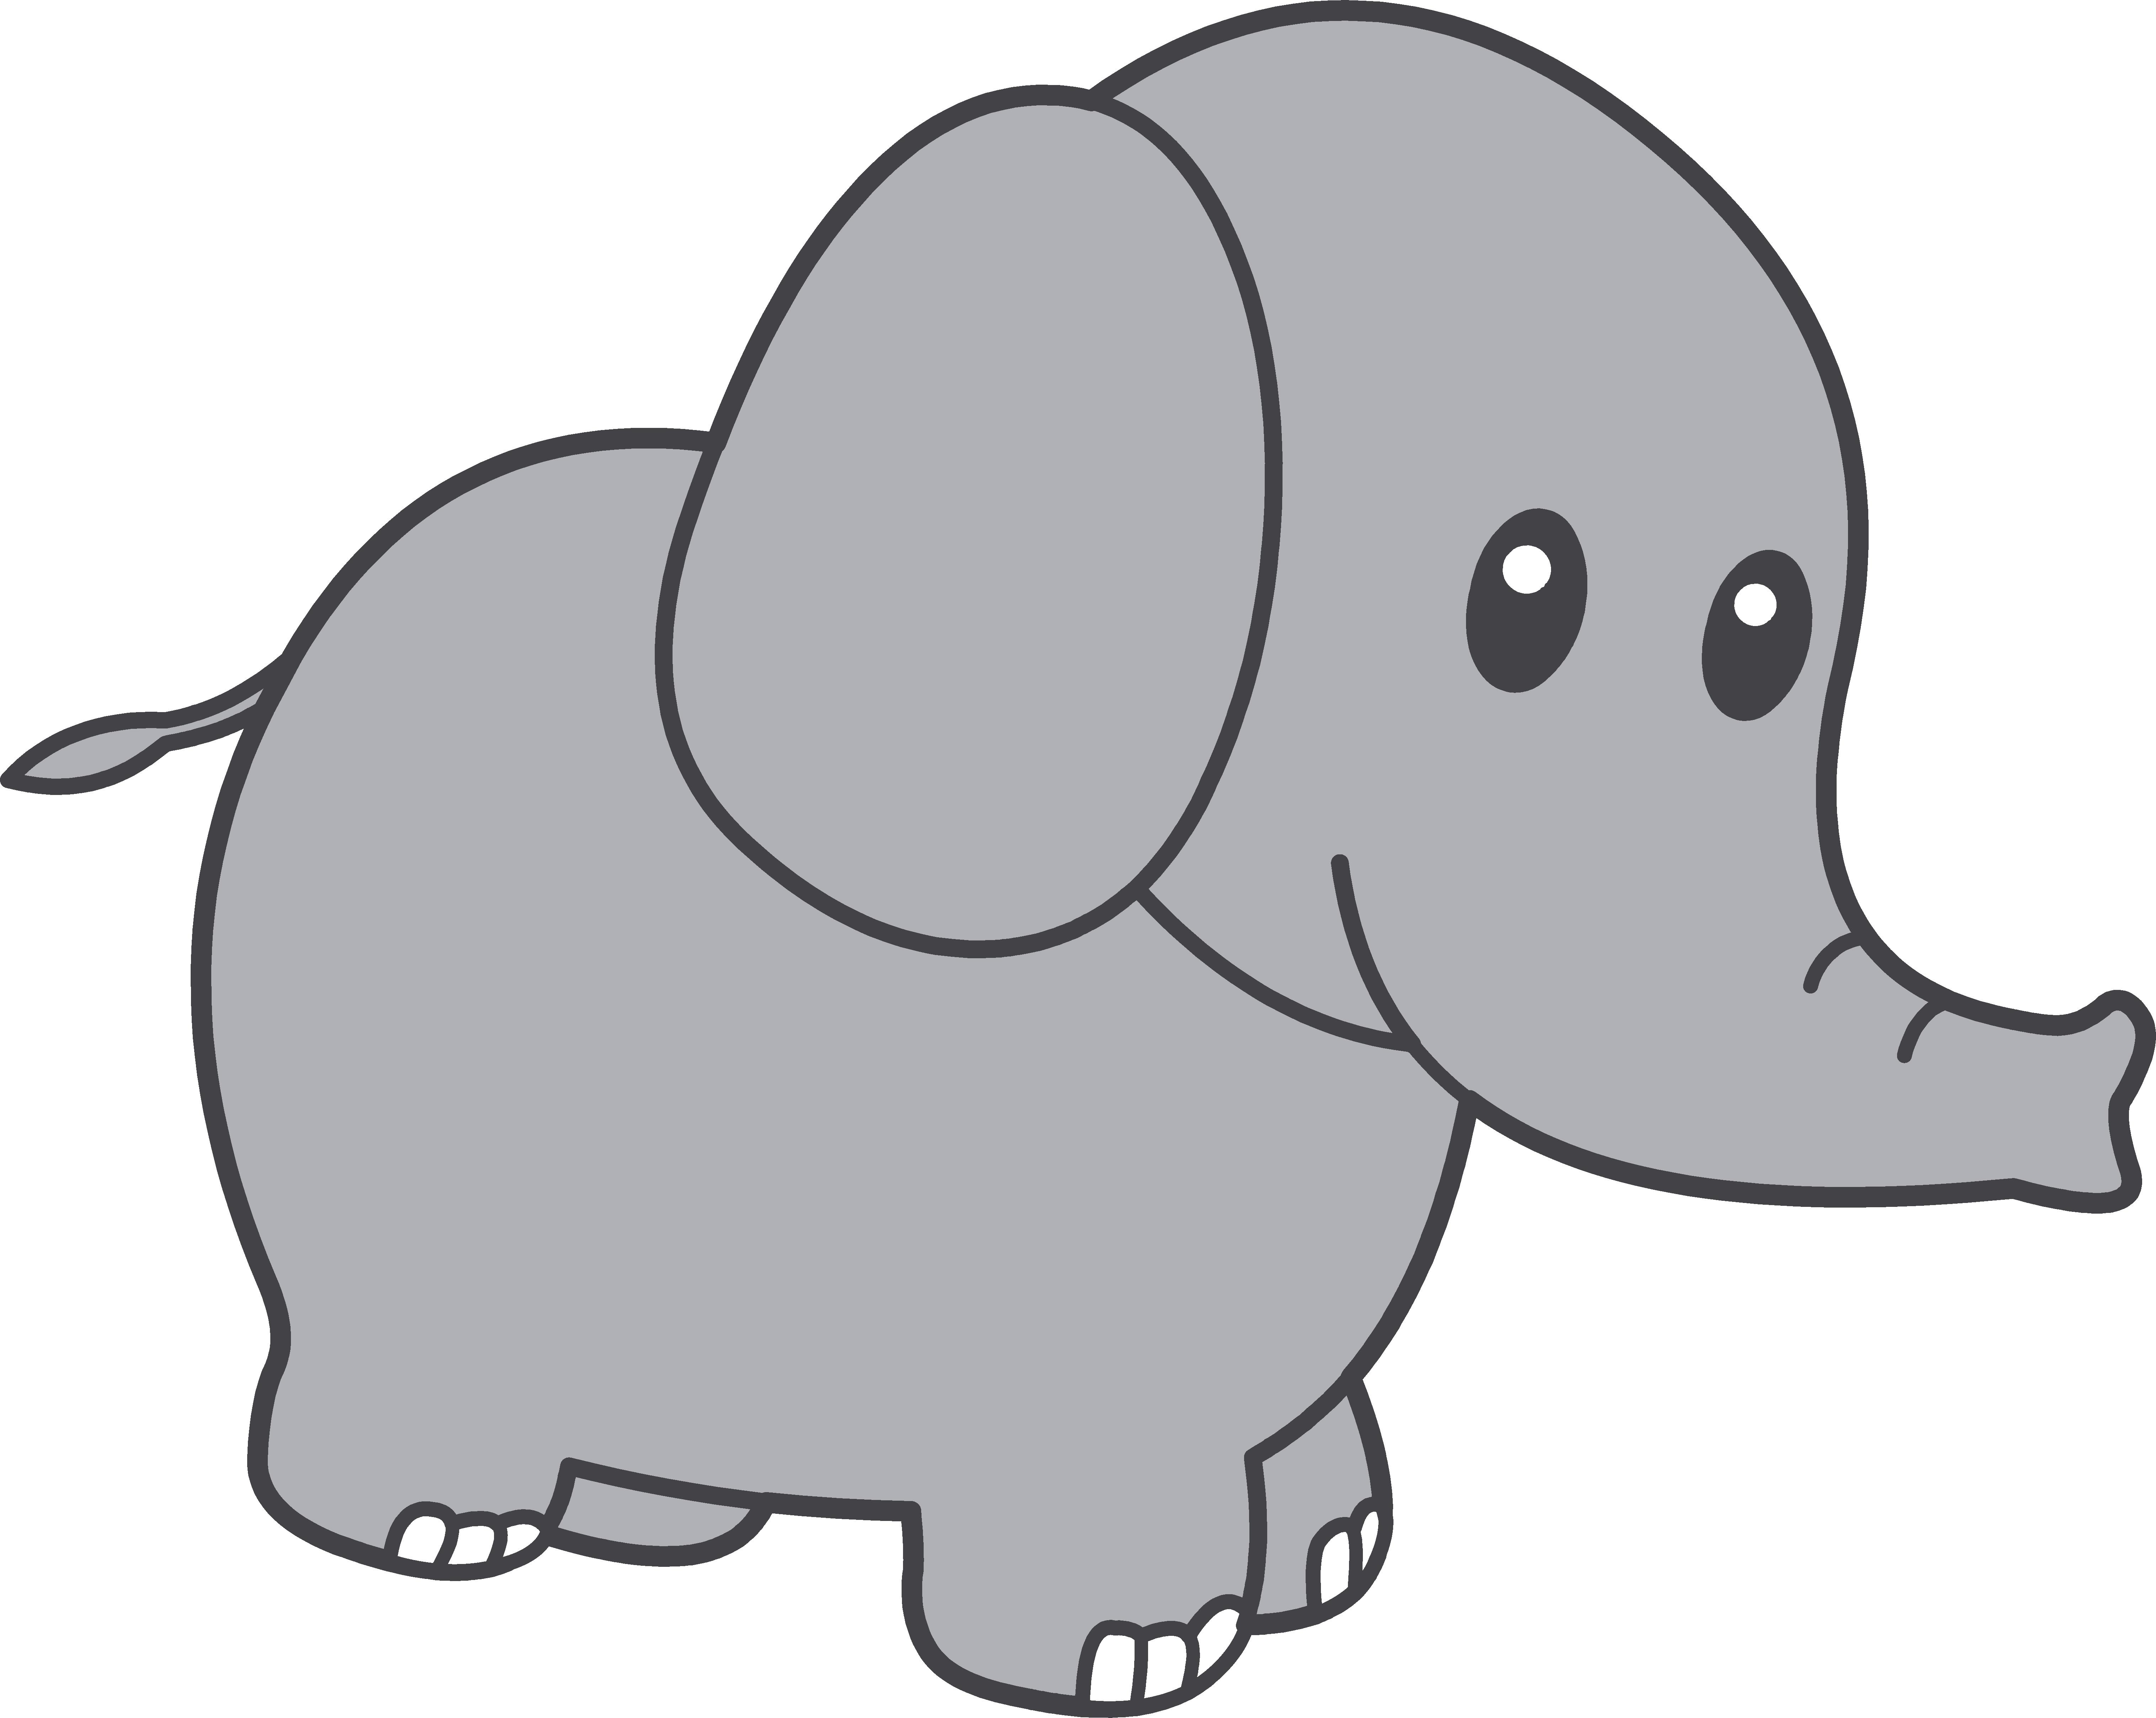 6062x4830 Cute Little Grey Elephant